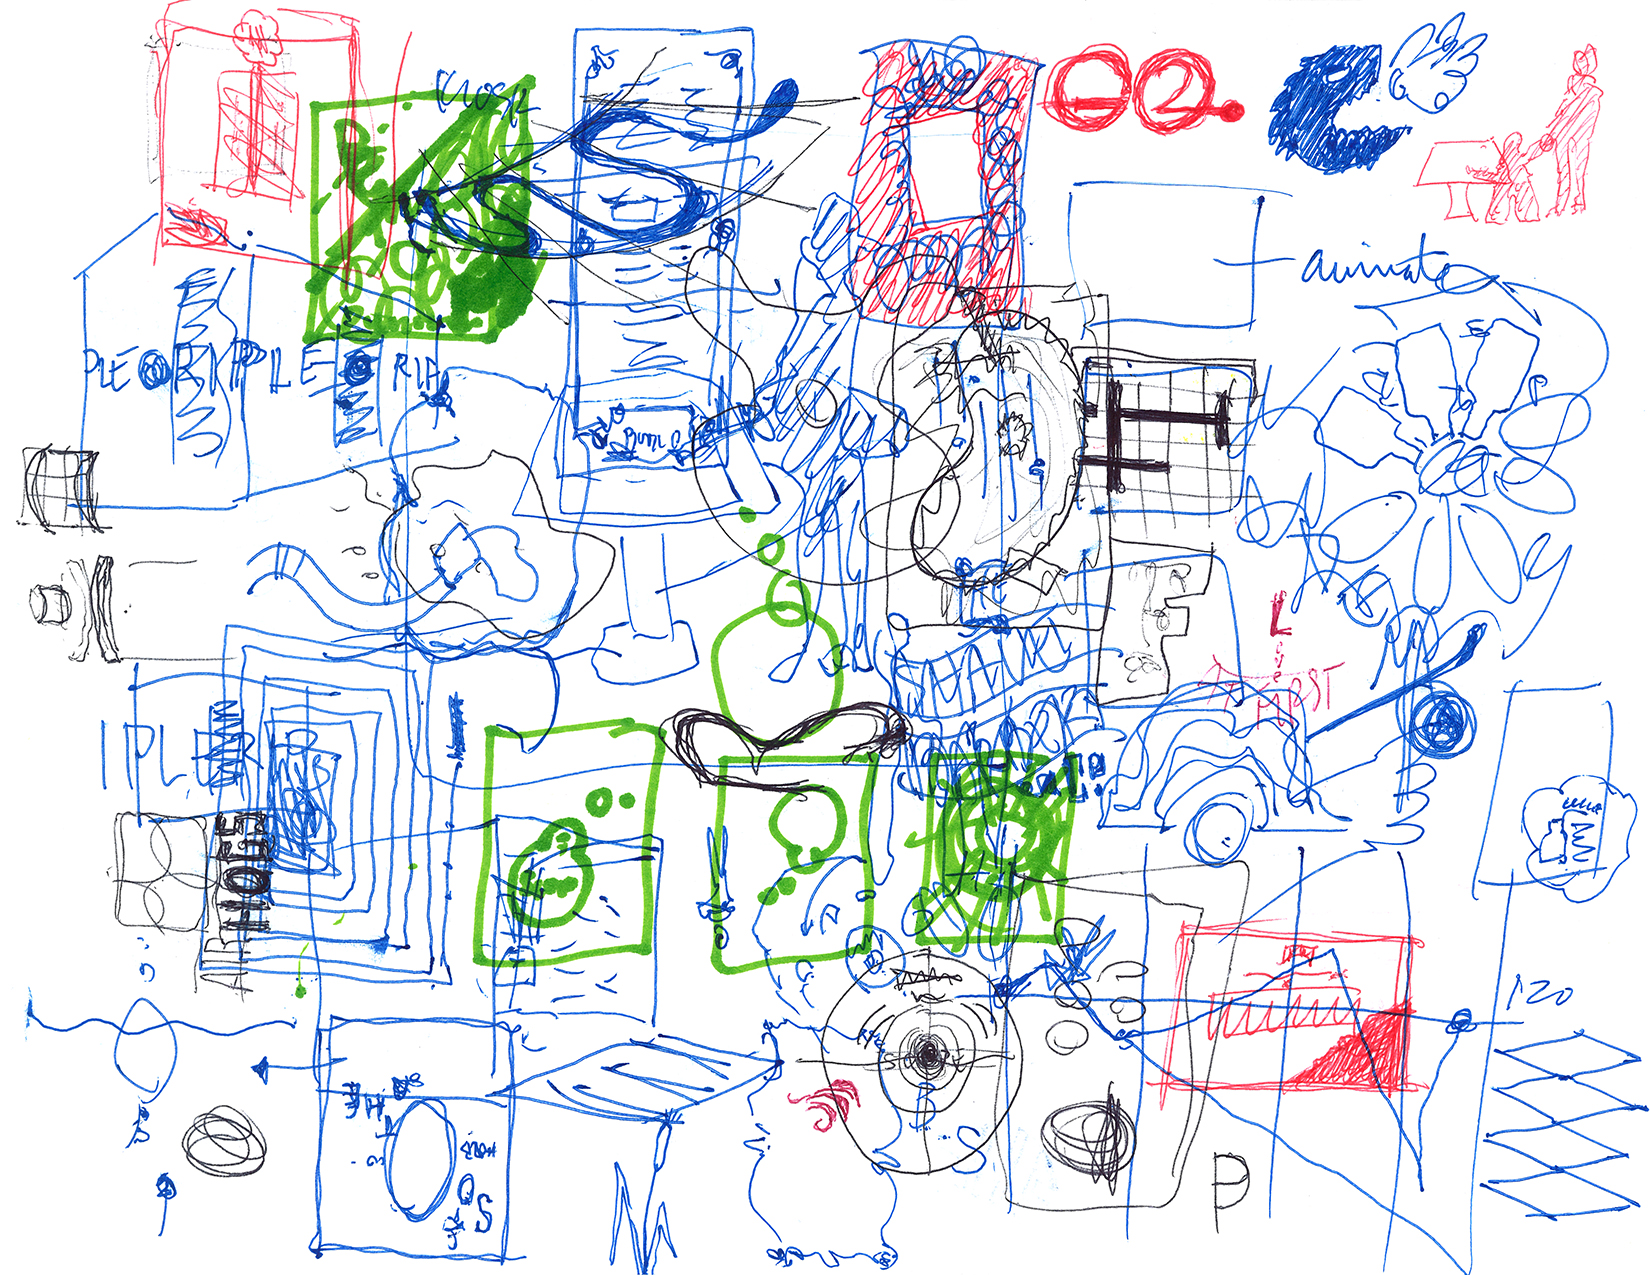 grad class doodles-03.19-LOW